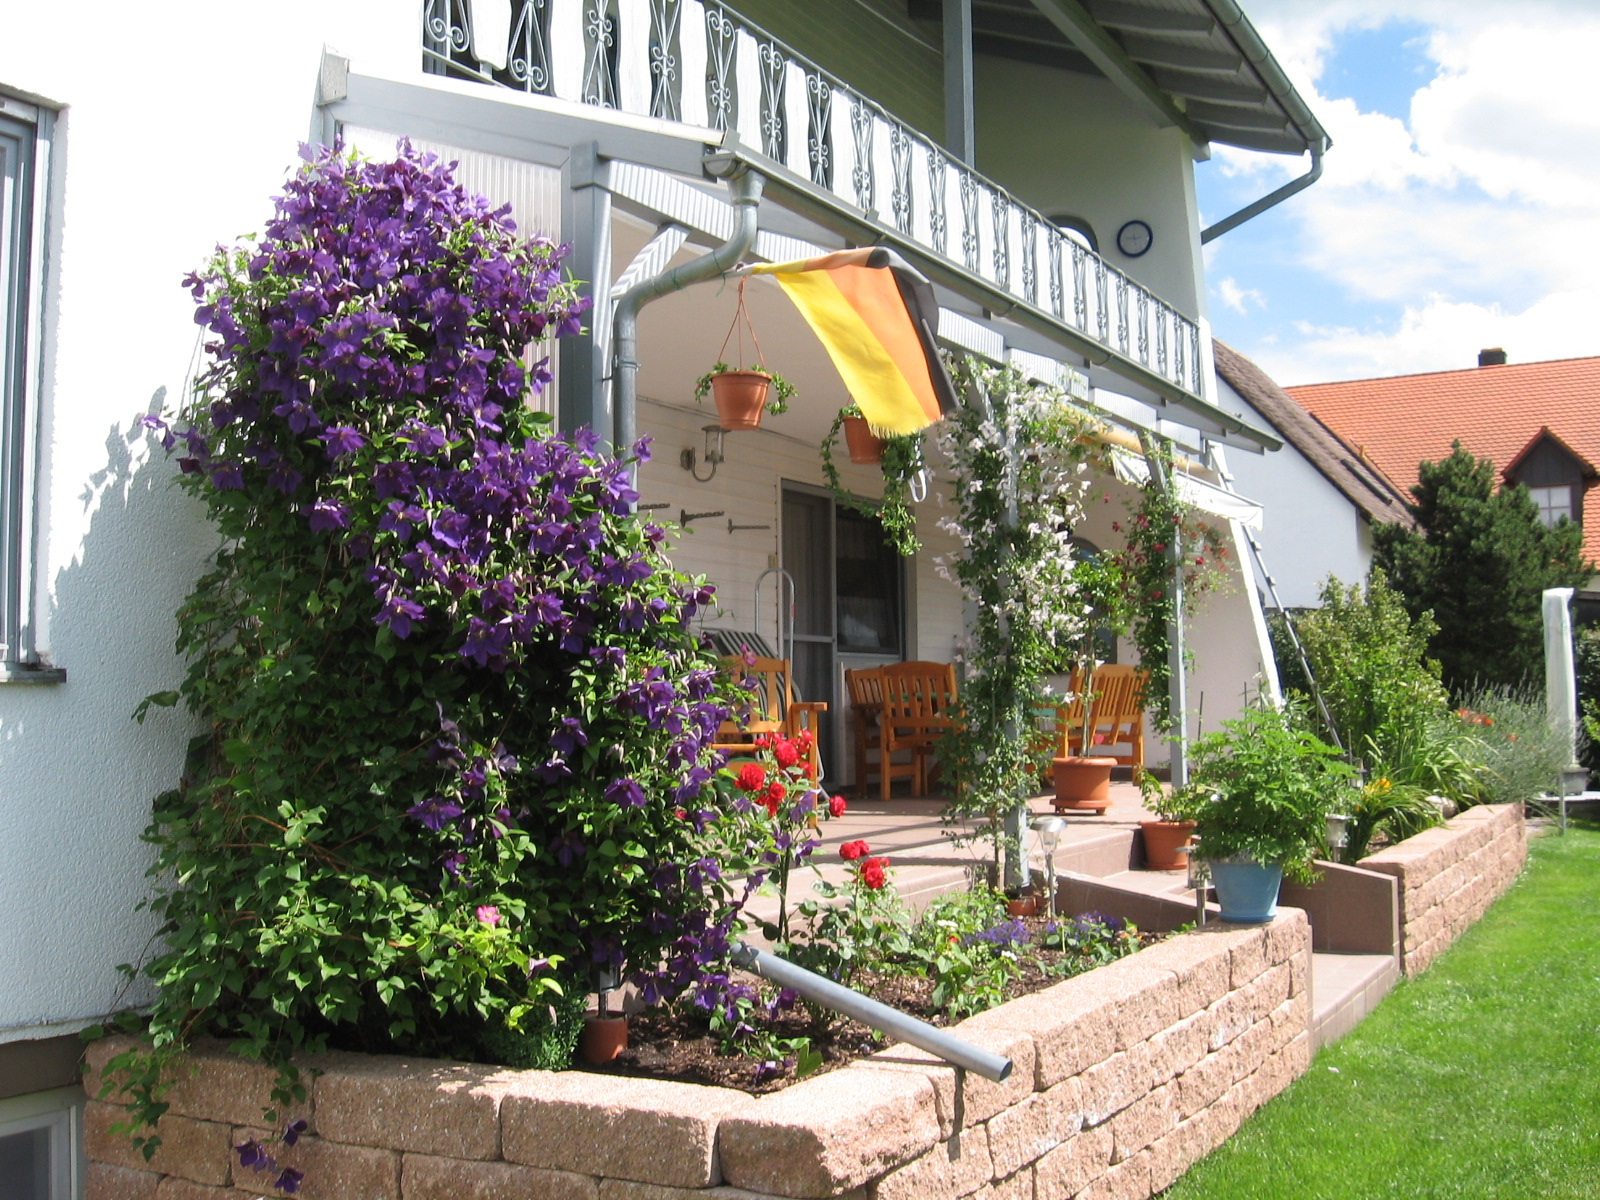 terrasse mit blumen - meuble garten, Gartengerate ideen